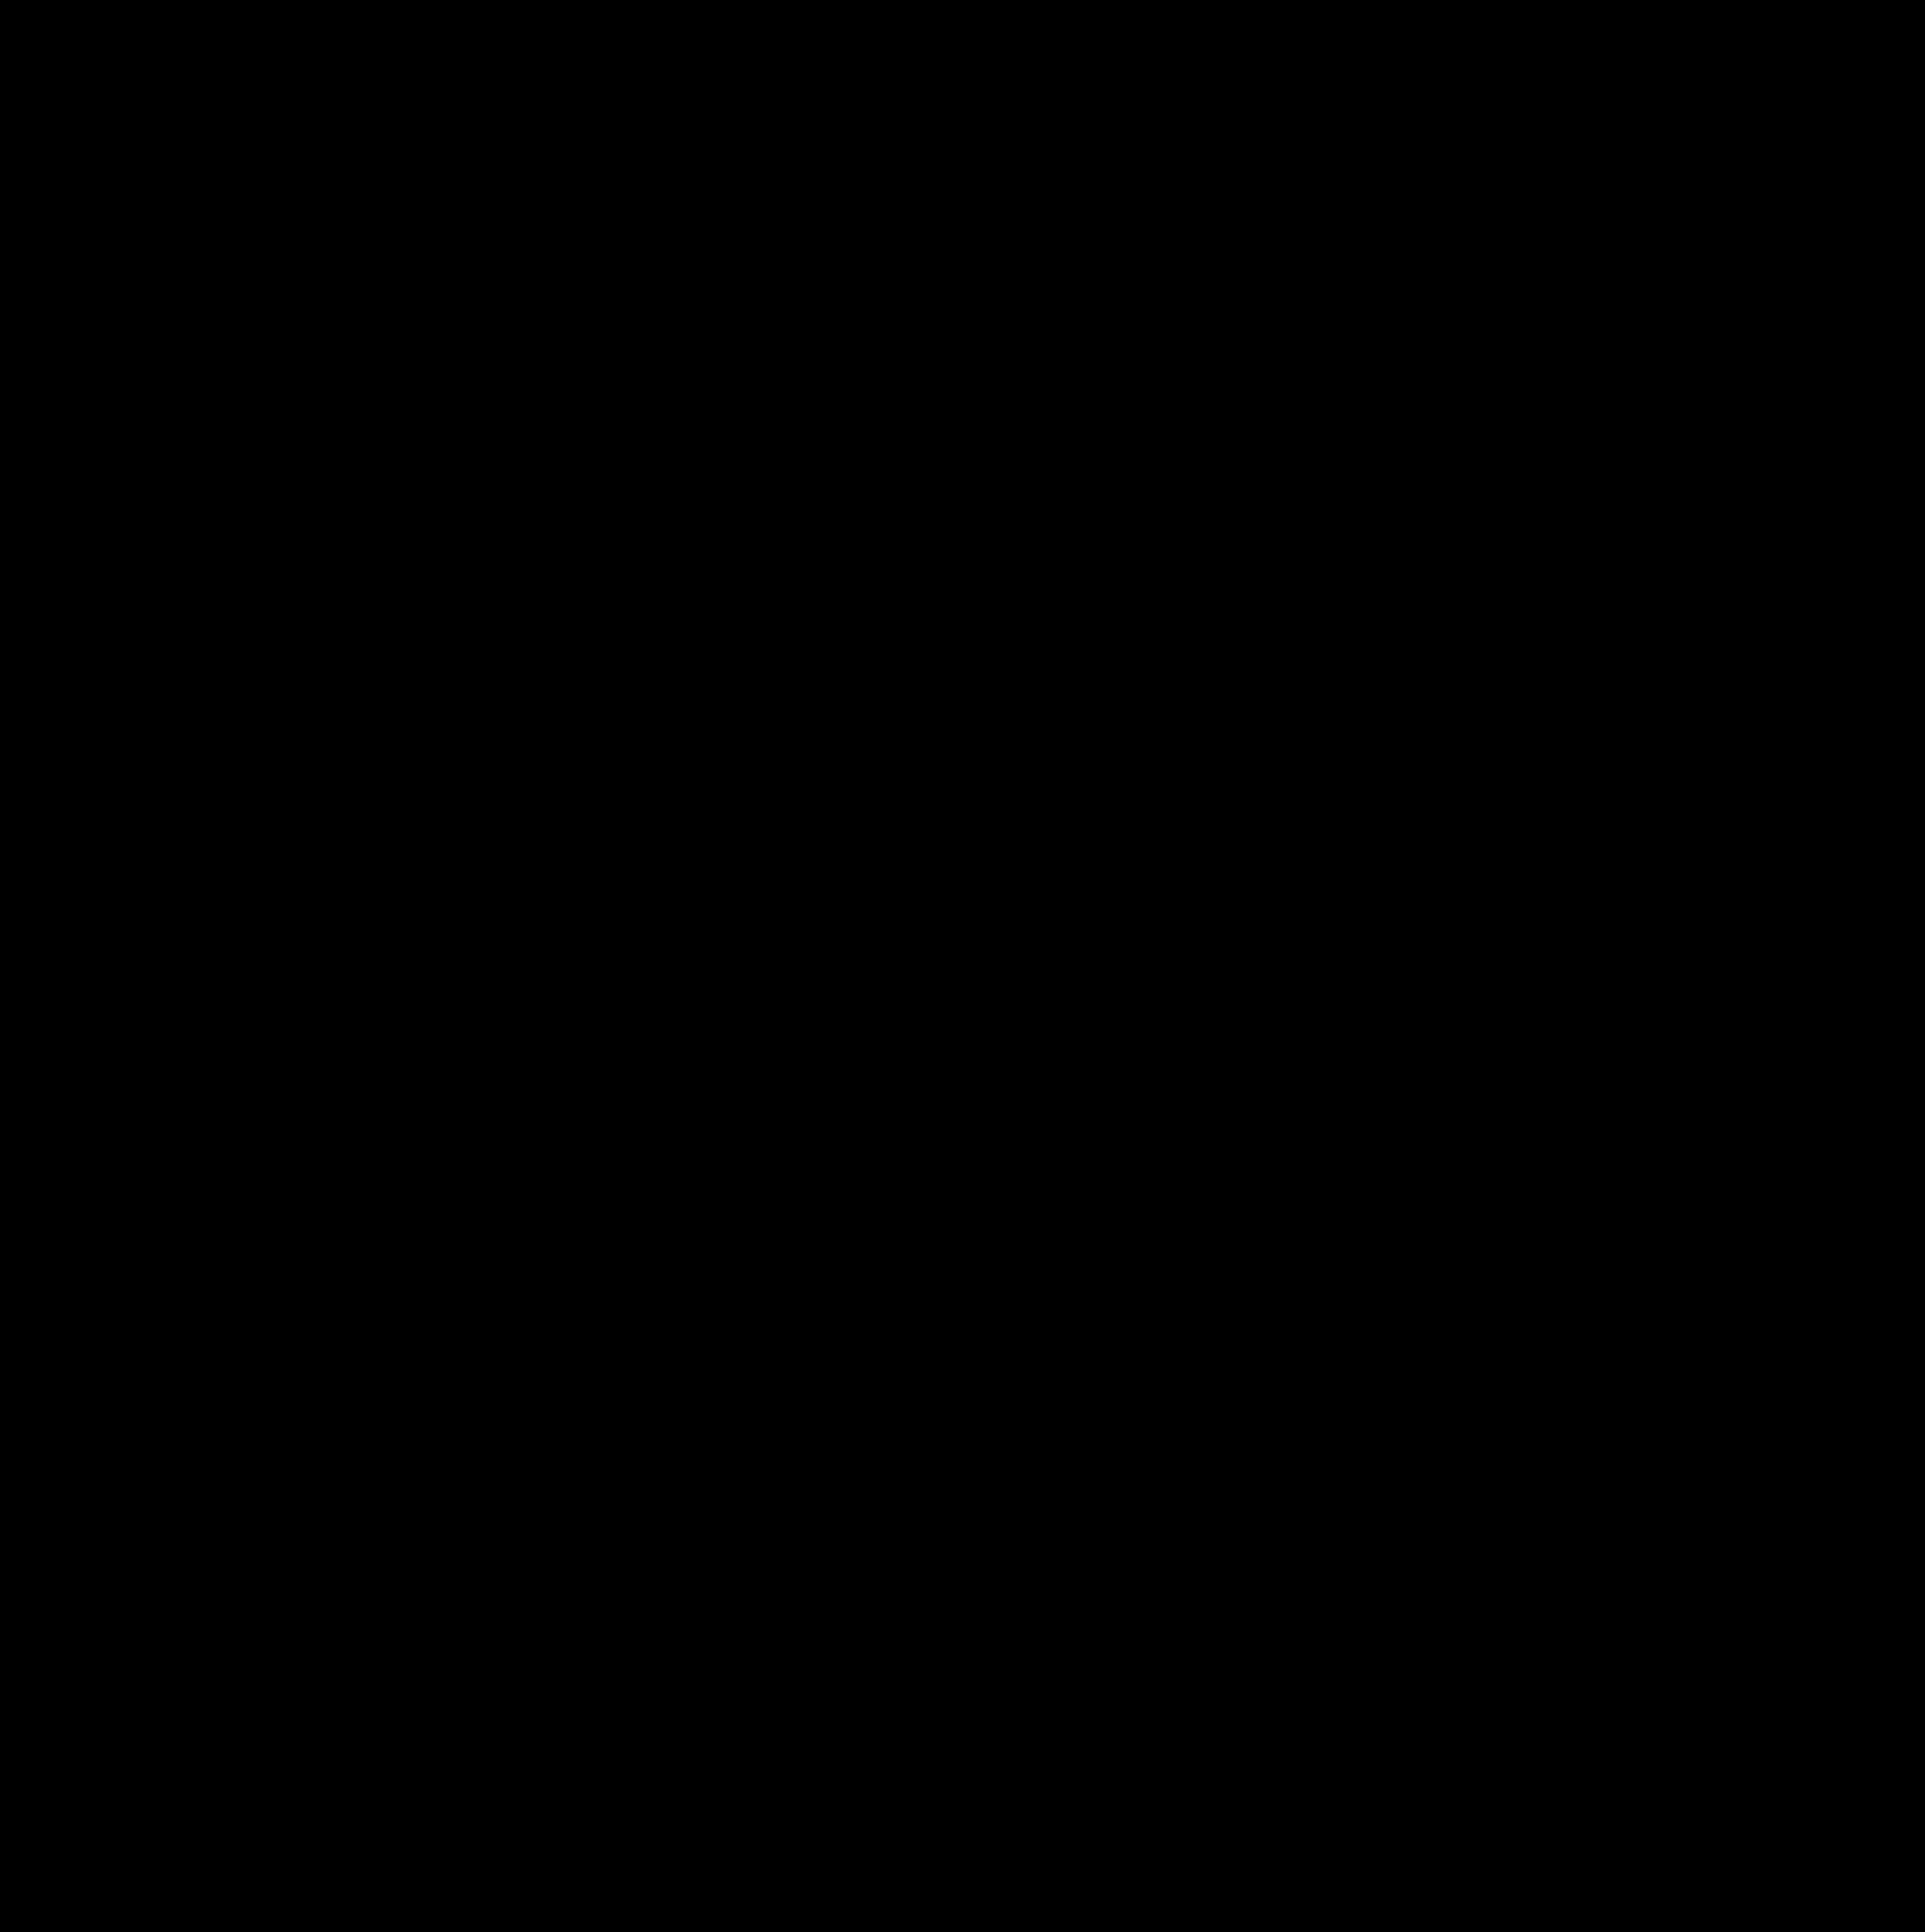 2309x2317 Sandhill Crane Silhouette Icons Png